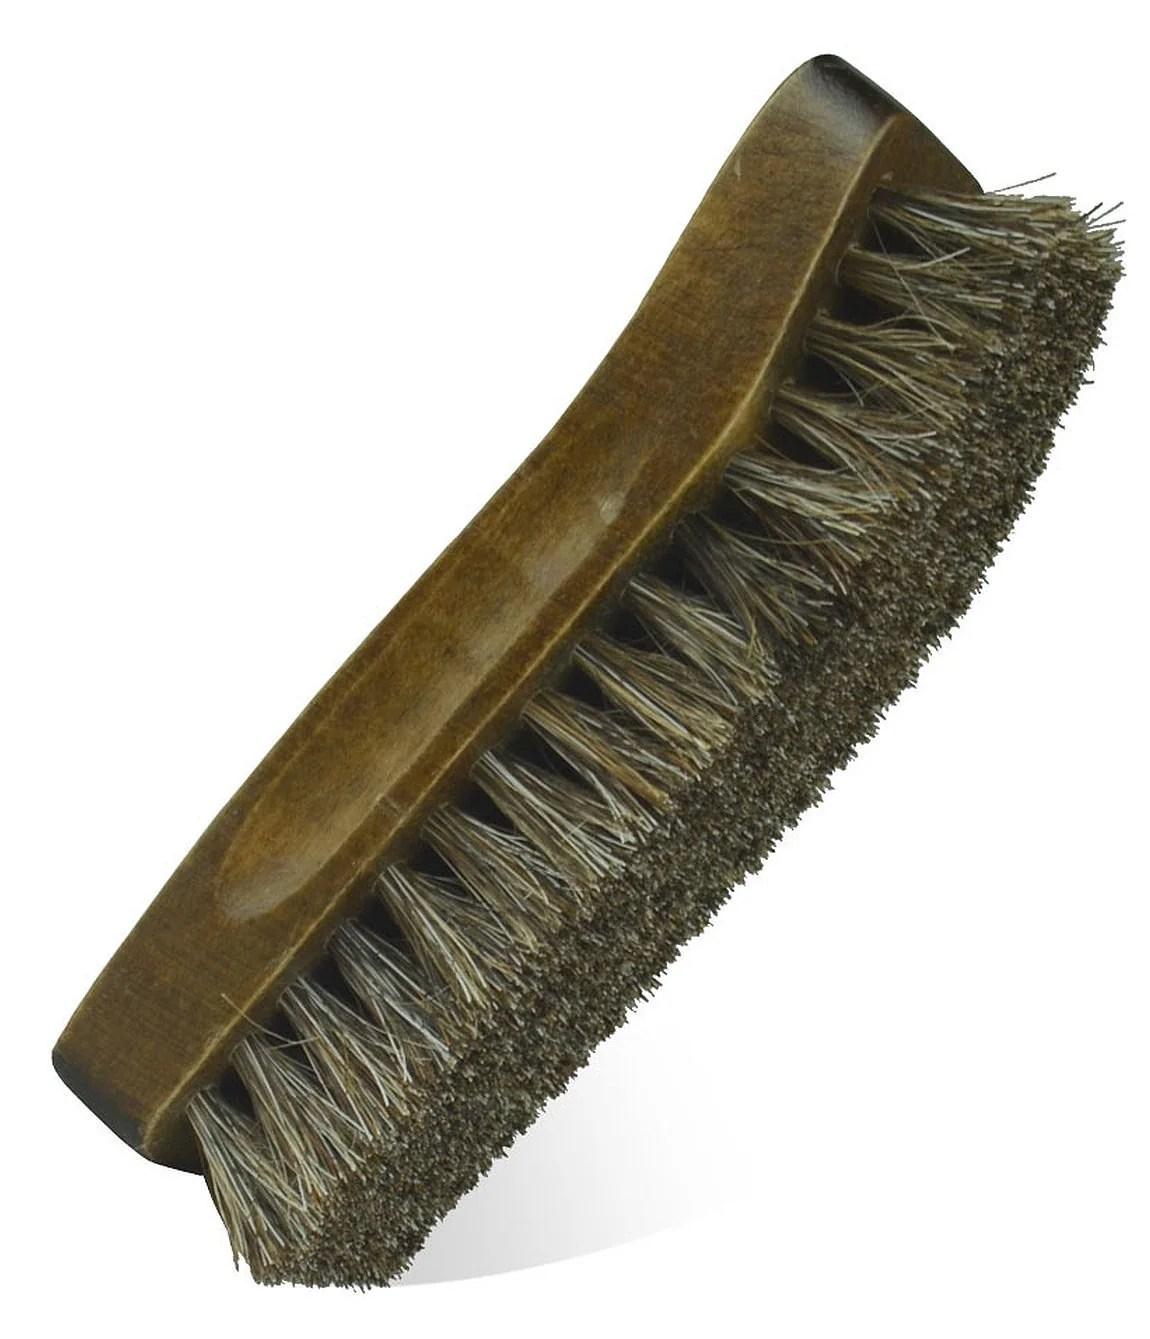 Small Boot Shoe Shine Brush 100 Brown Horsehair Bristles